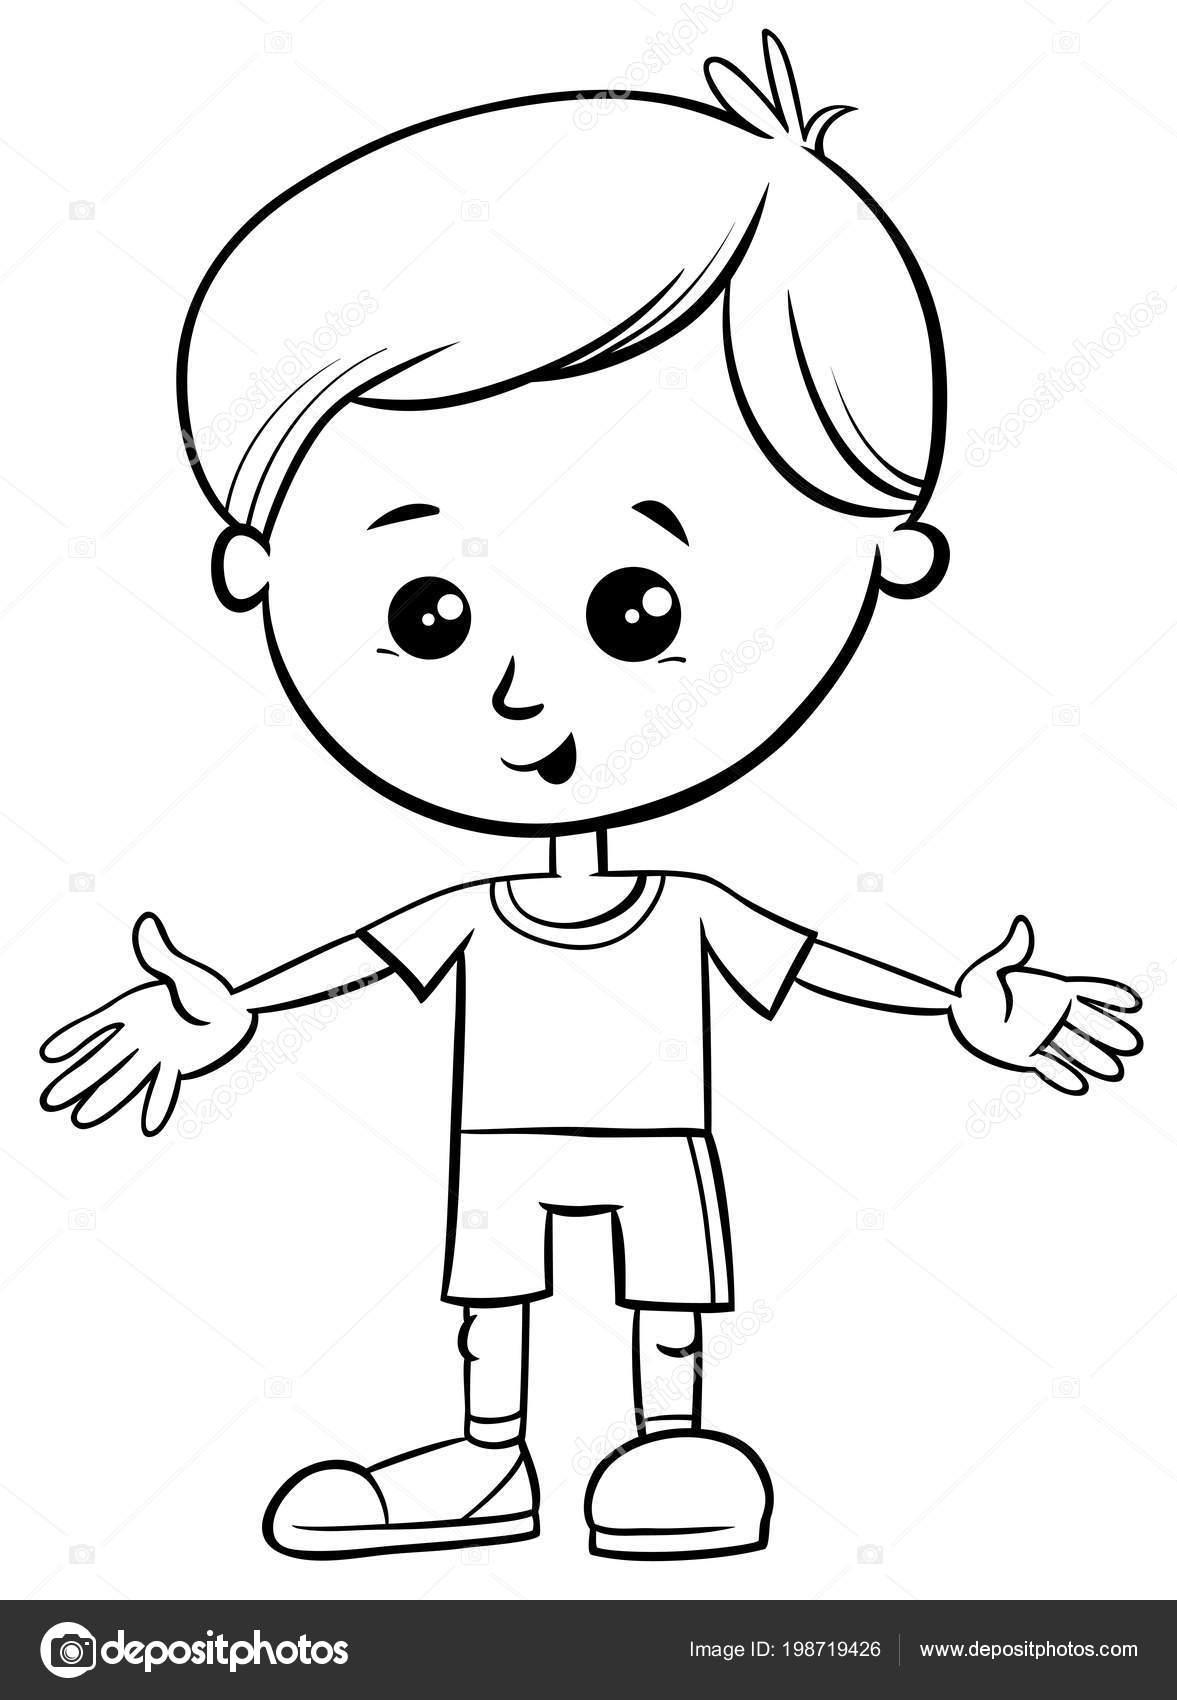 Blanco Negro Ilustración Dibujos Animados Lindo Niño Personaje